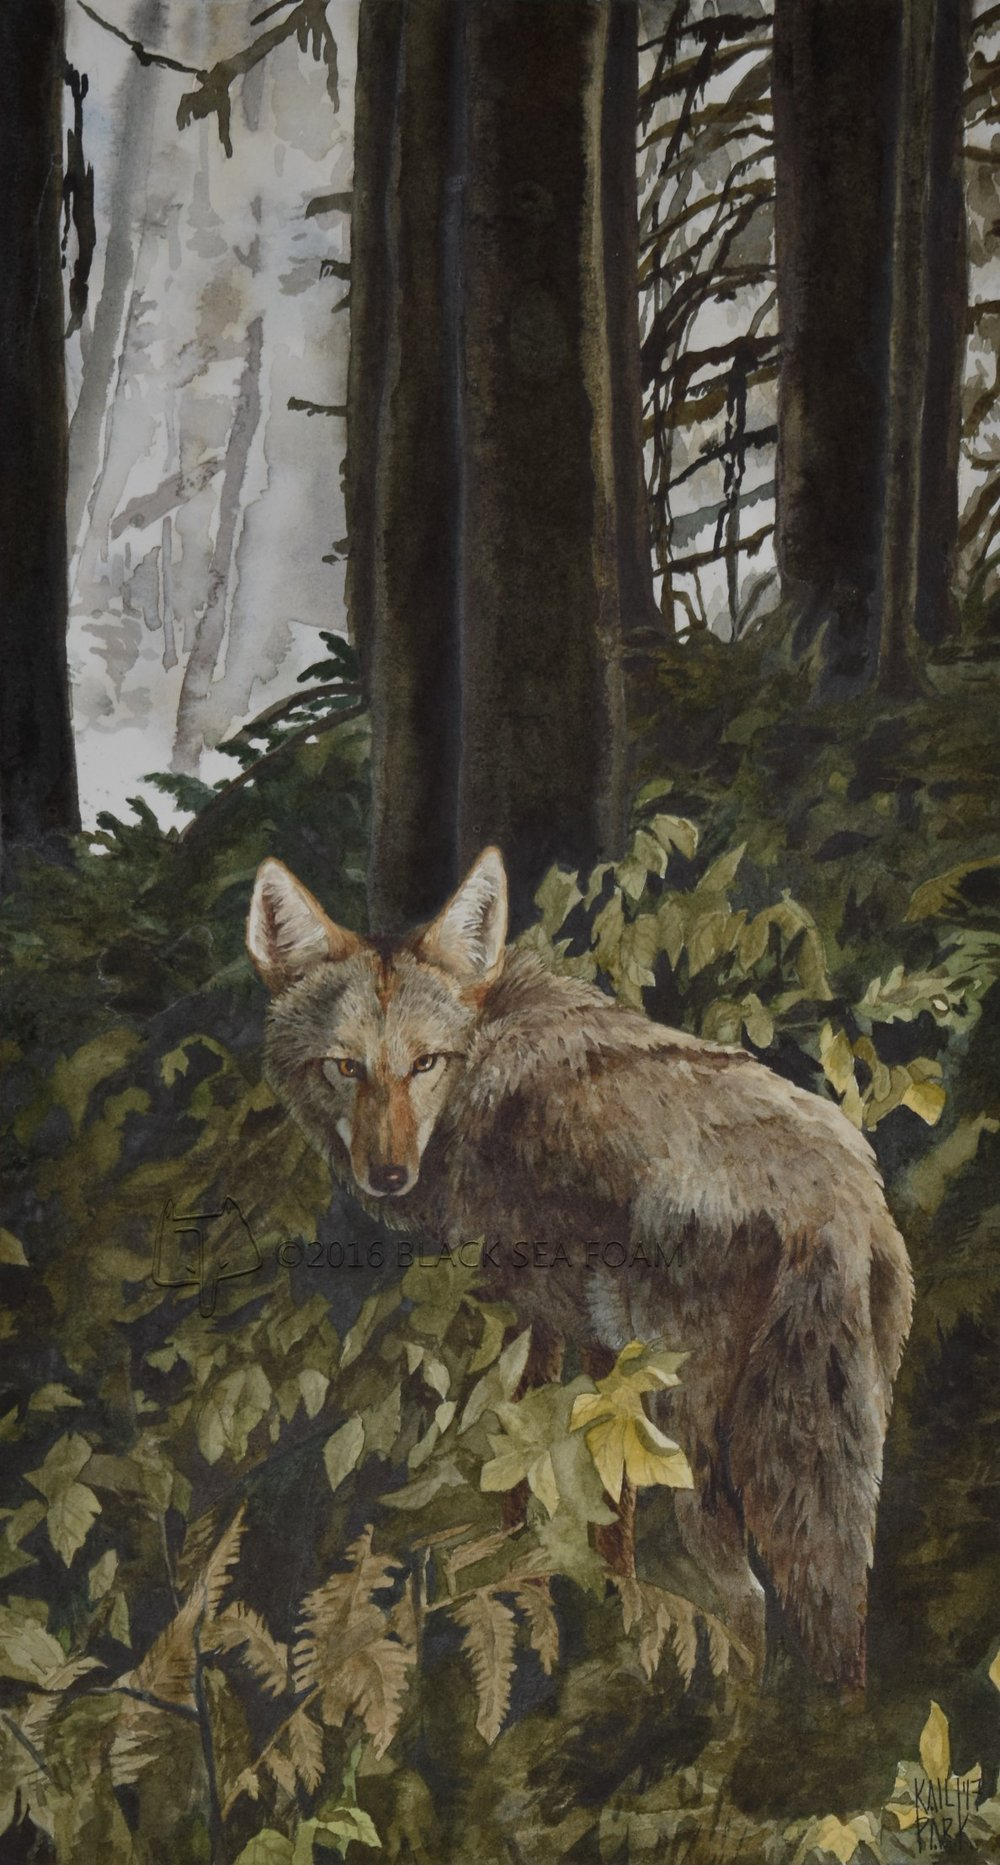 coyote+web.jpg